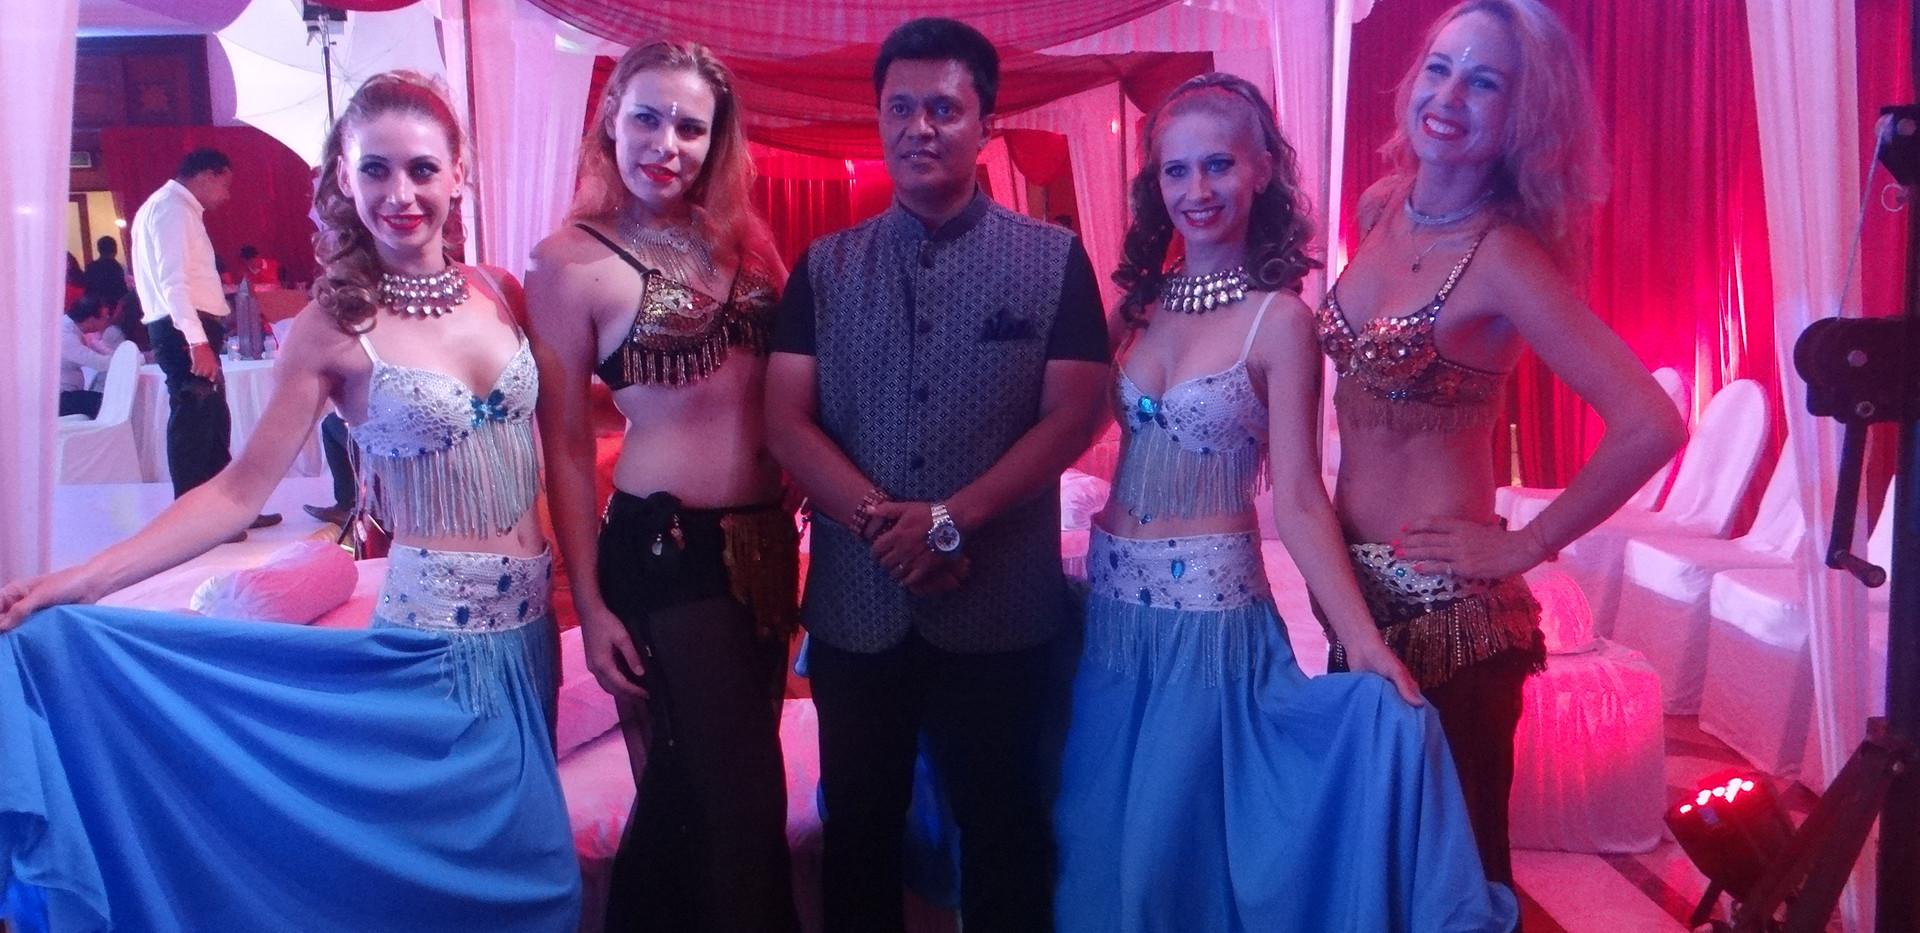 Russian Belly dancers